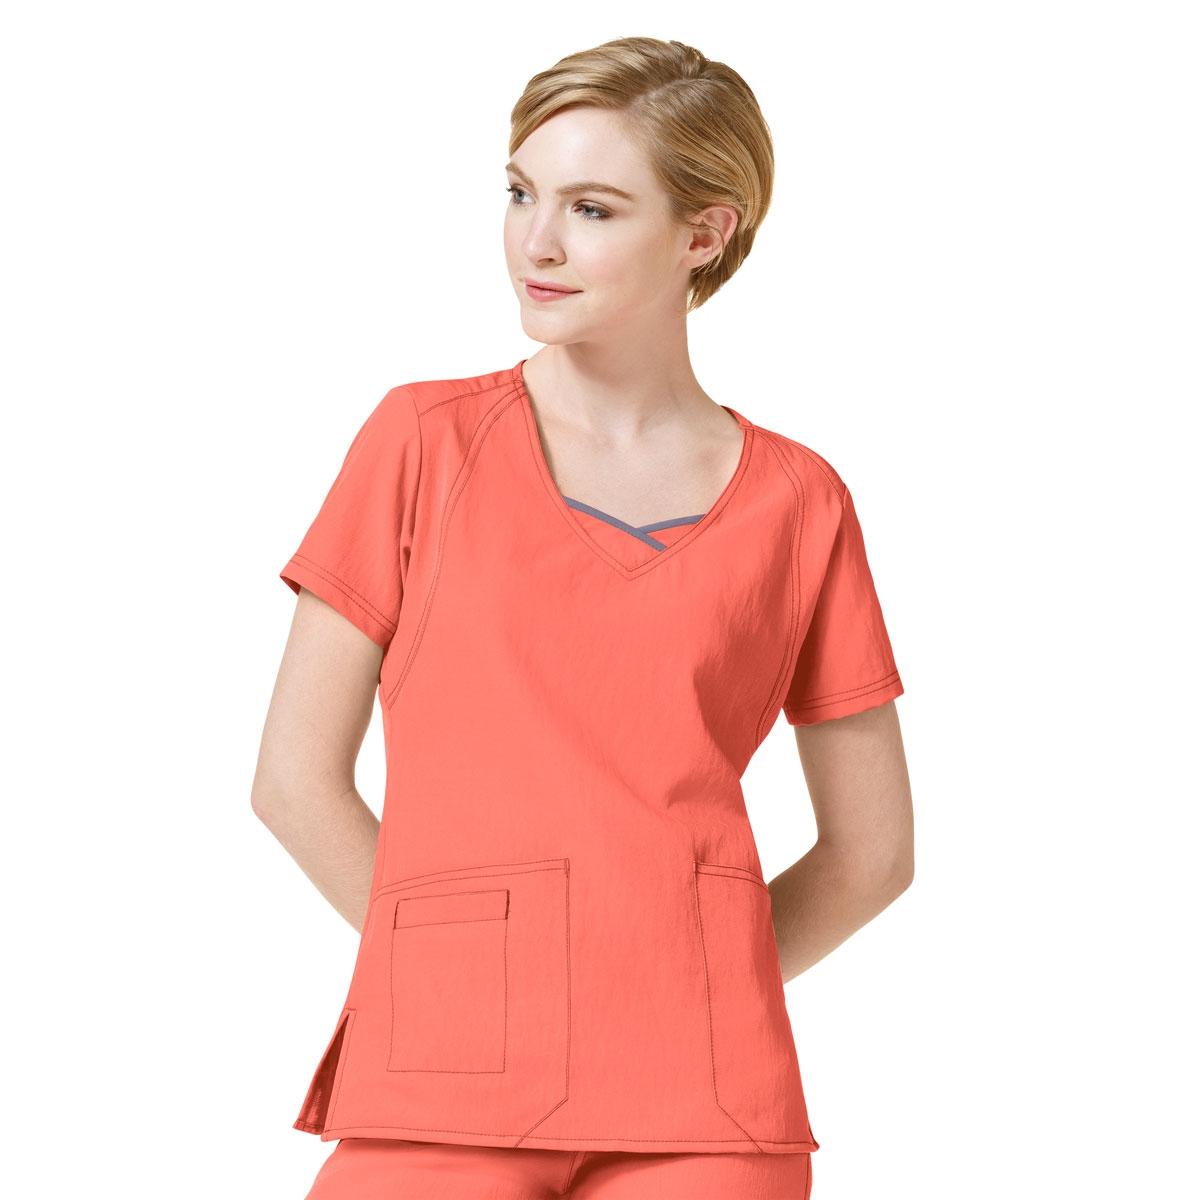 137d49423b6 Four-Stretch Curve-Centric Fashion Womens Scrub Tops - WonderWink Scrubs